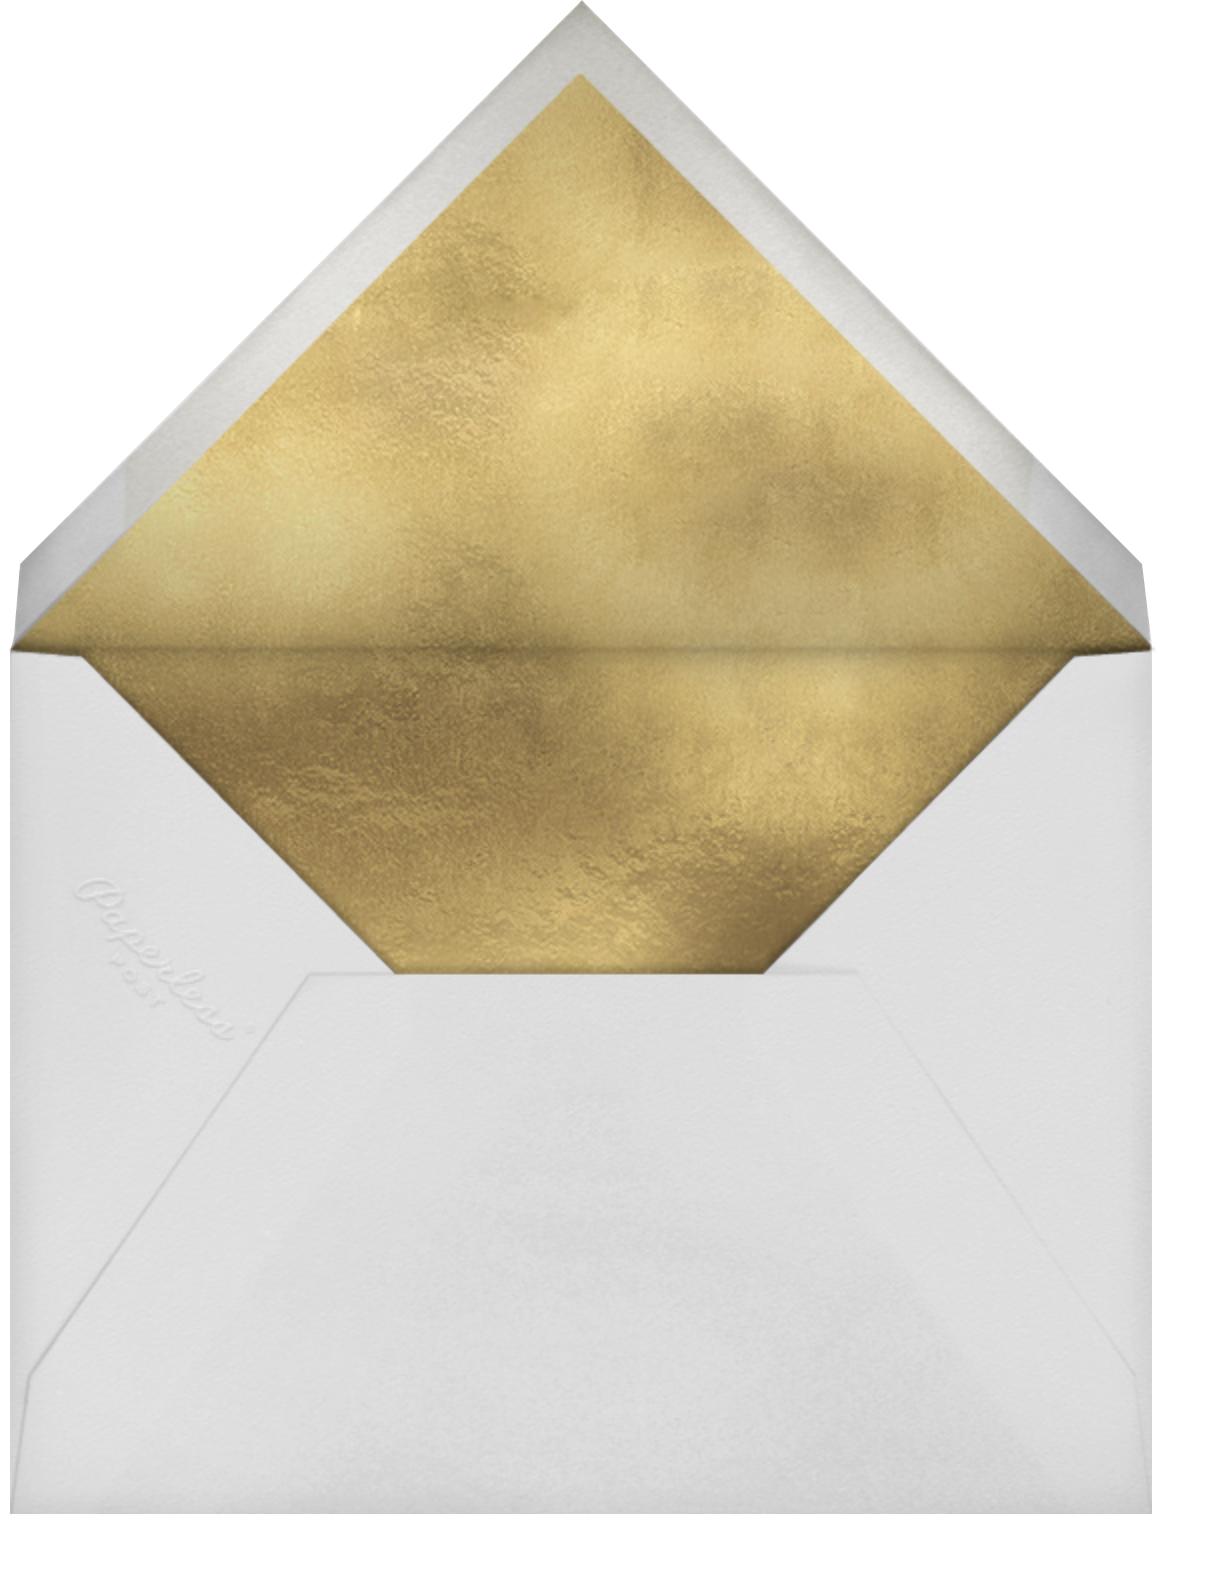 Flowering Mimosa (Invitation) - Navy - Oscar de la Renta - All - envelope back